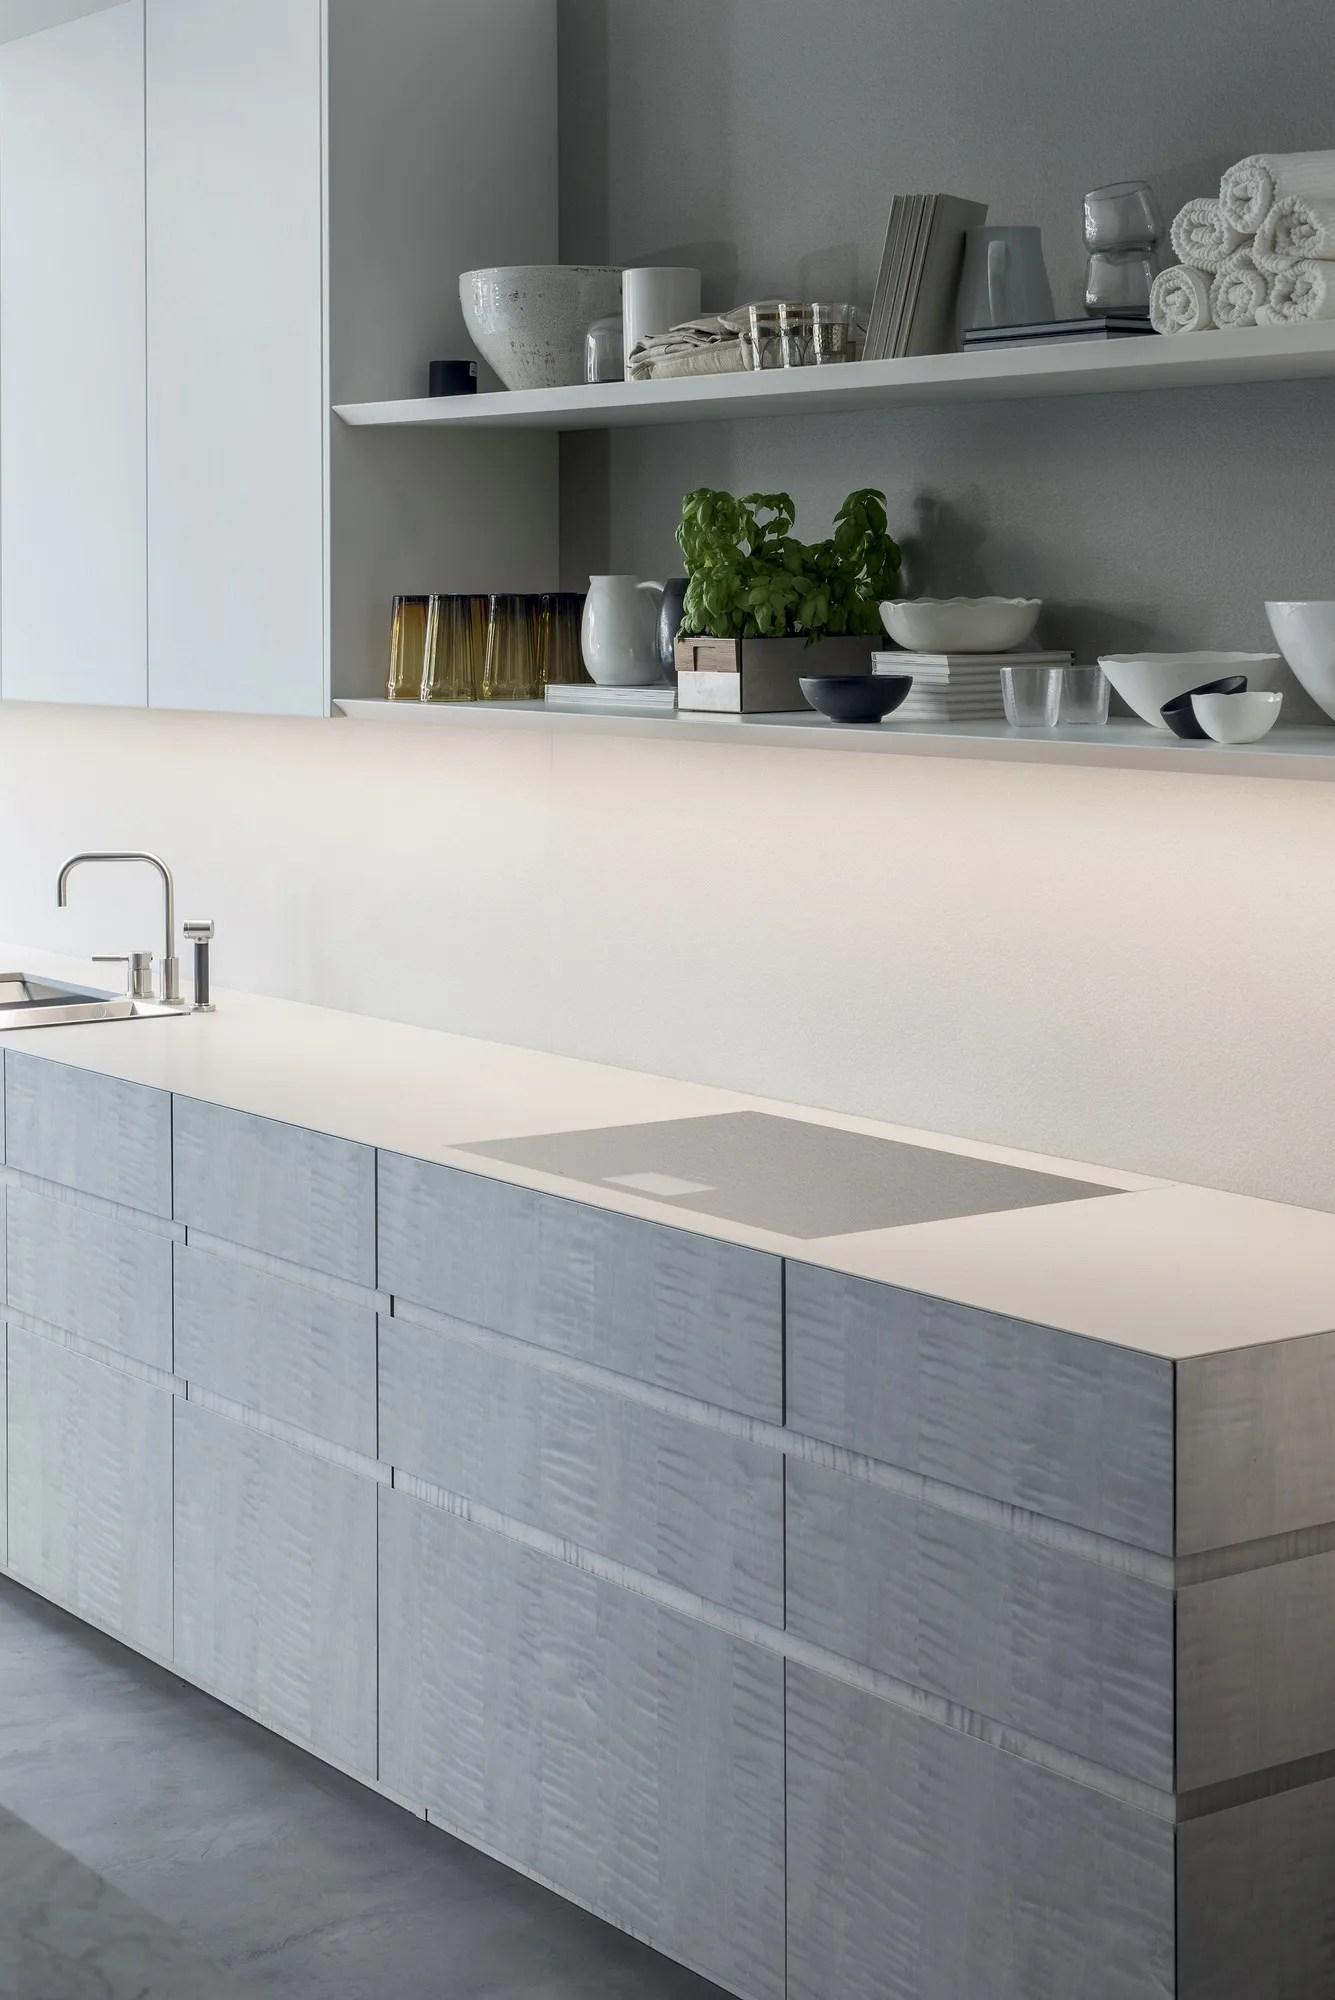 T45 EVO  K6  Linear kitchen By TM Italia Cucine design